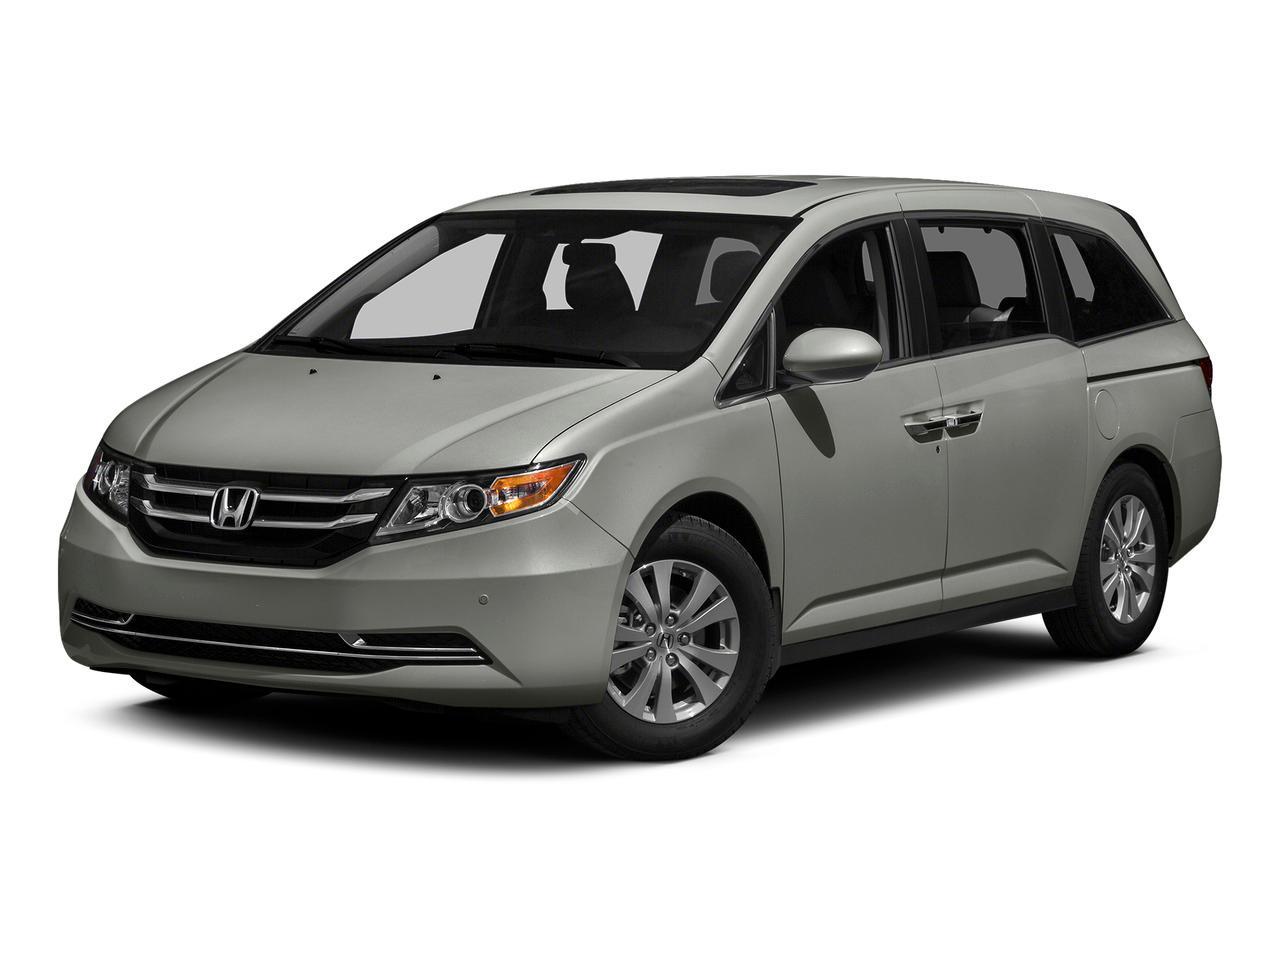 2015 Honda Odyssey Vehicle Photo in Charlotte, NC 28227